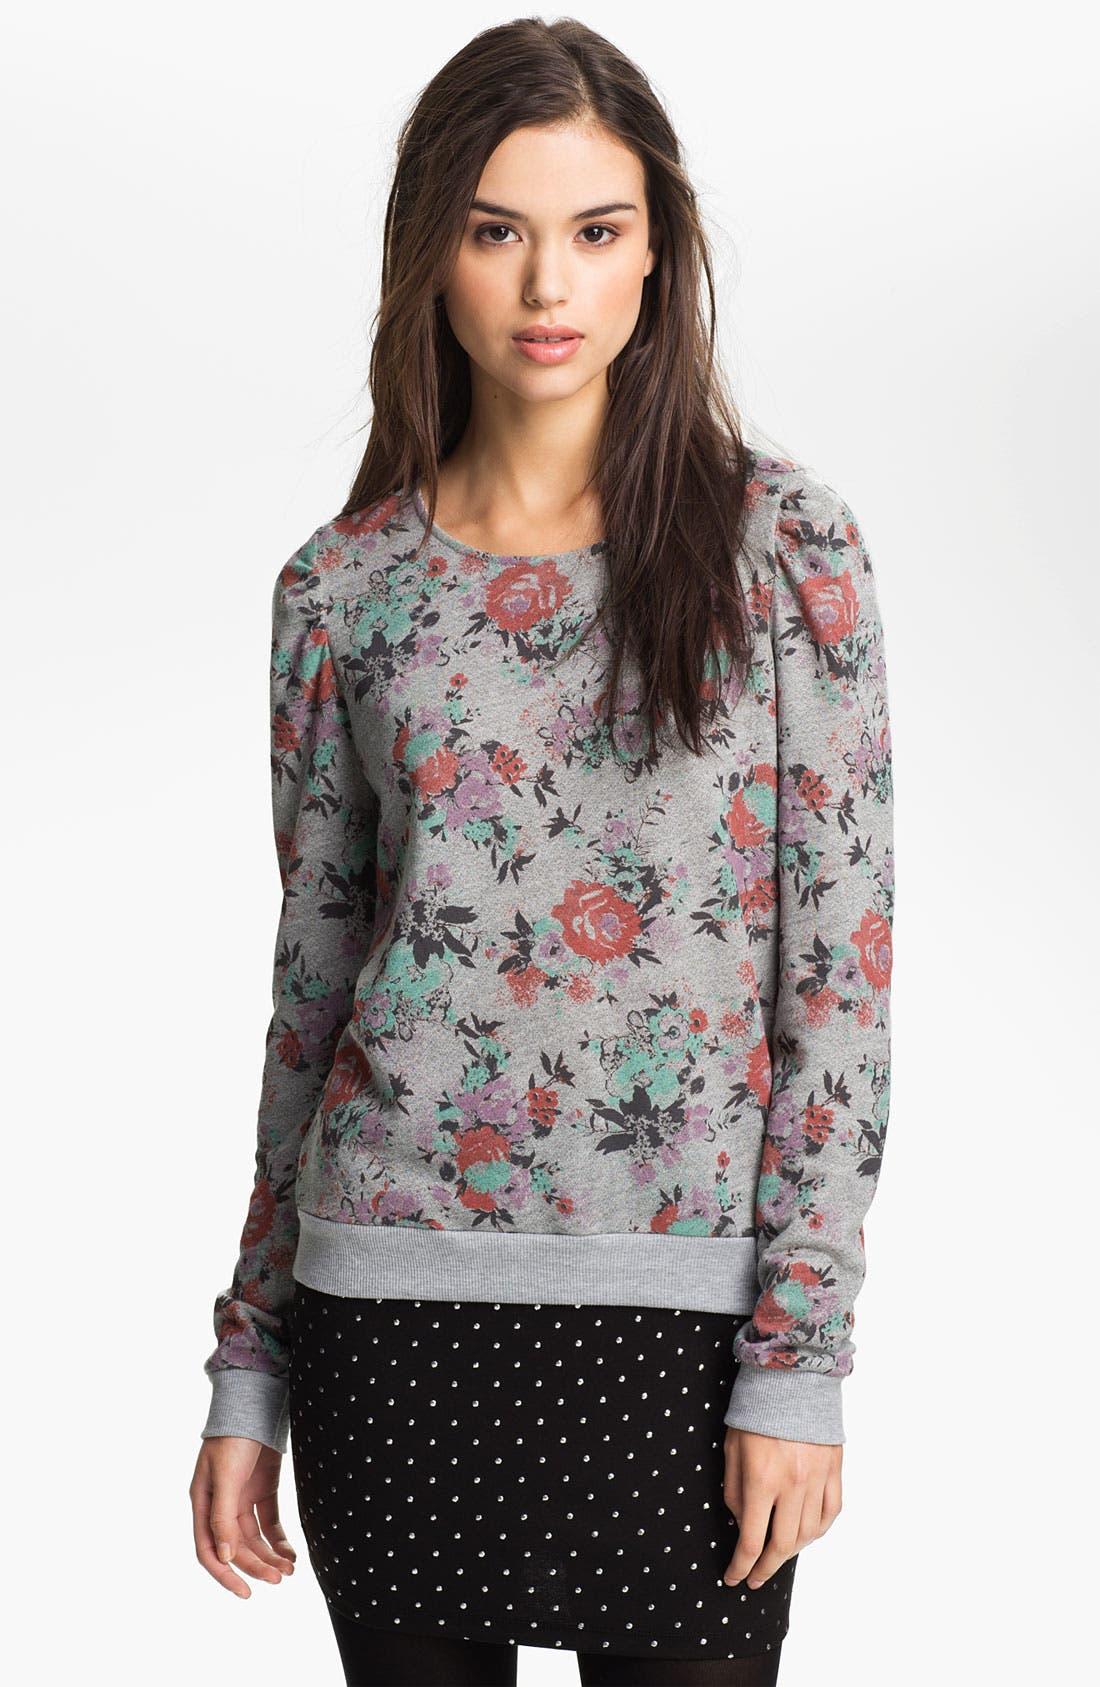 Alternate Image 1 Selected - Ten Sixty Sherman Puff Sleeve Sweatshirt (Juniors)